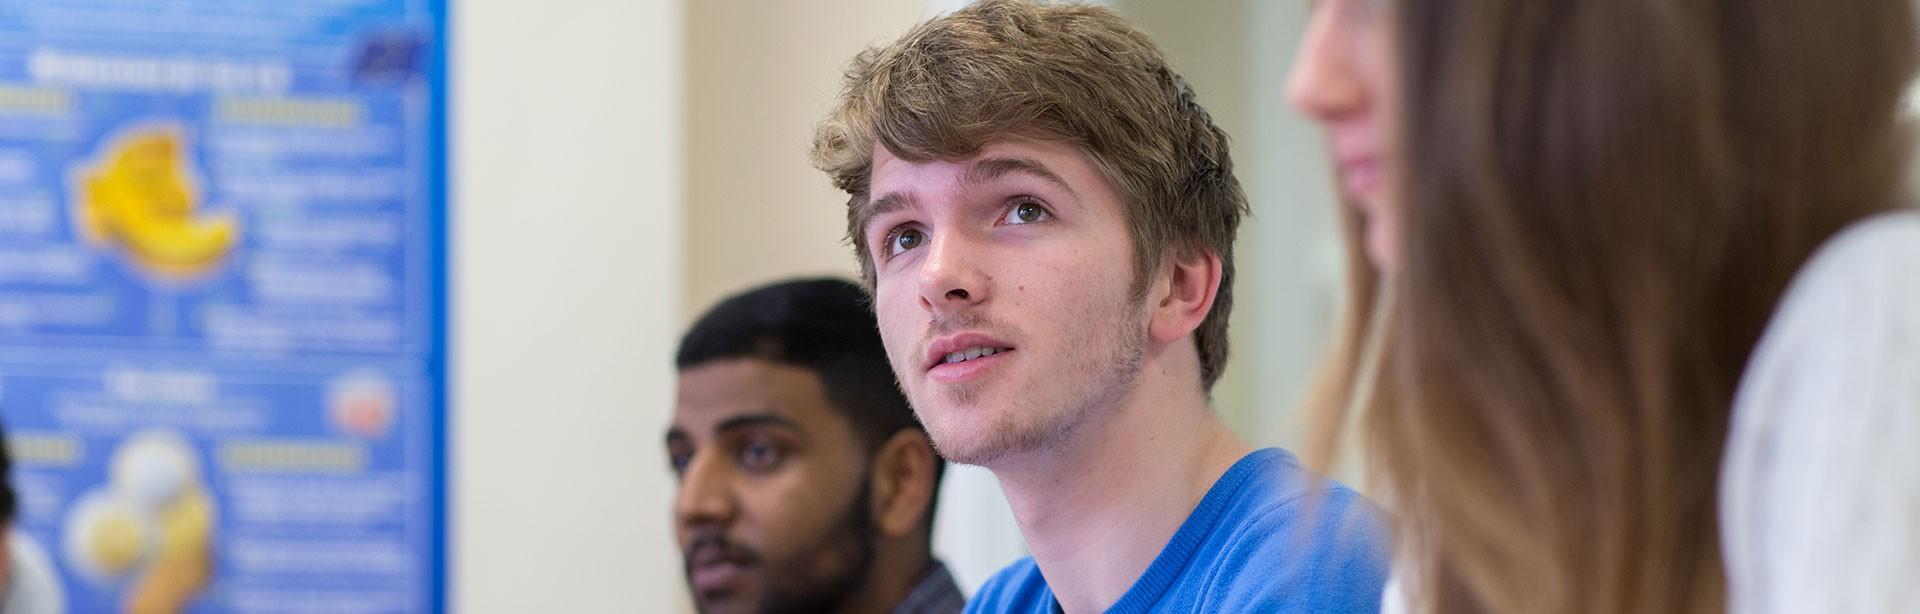 Educatius-UK-ChelseaIndependentCollege-StudentsInClass-Banner-2019